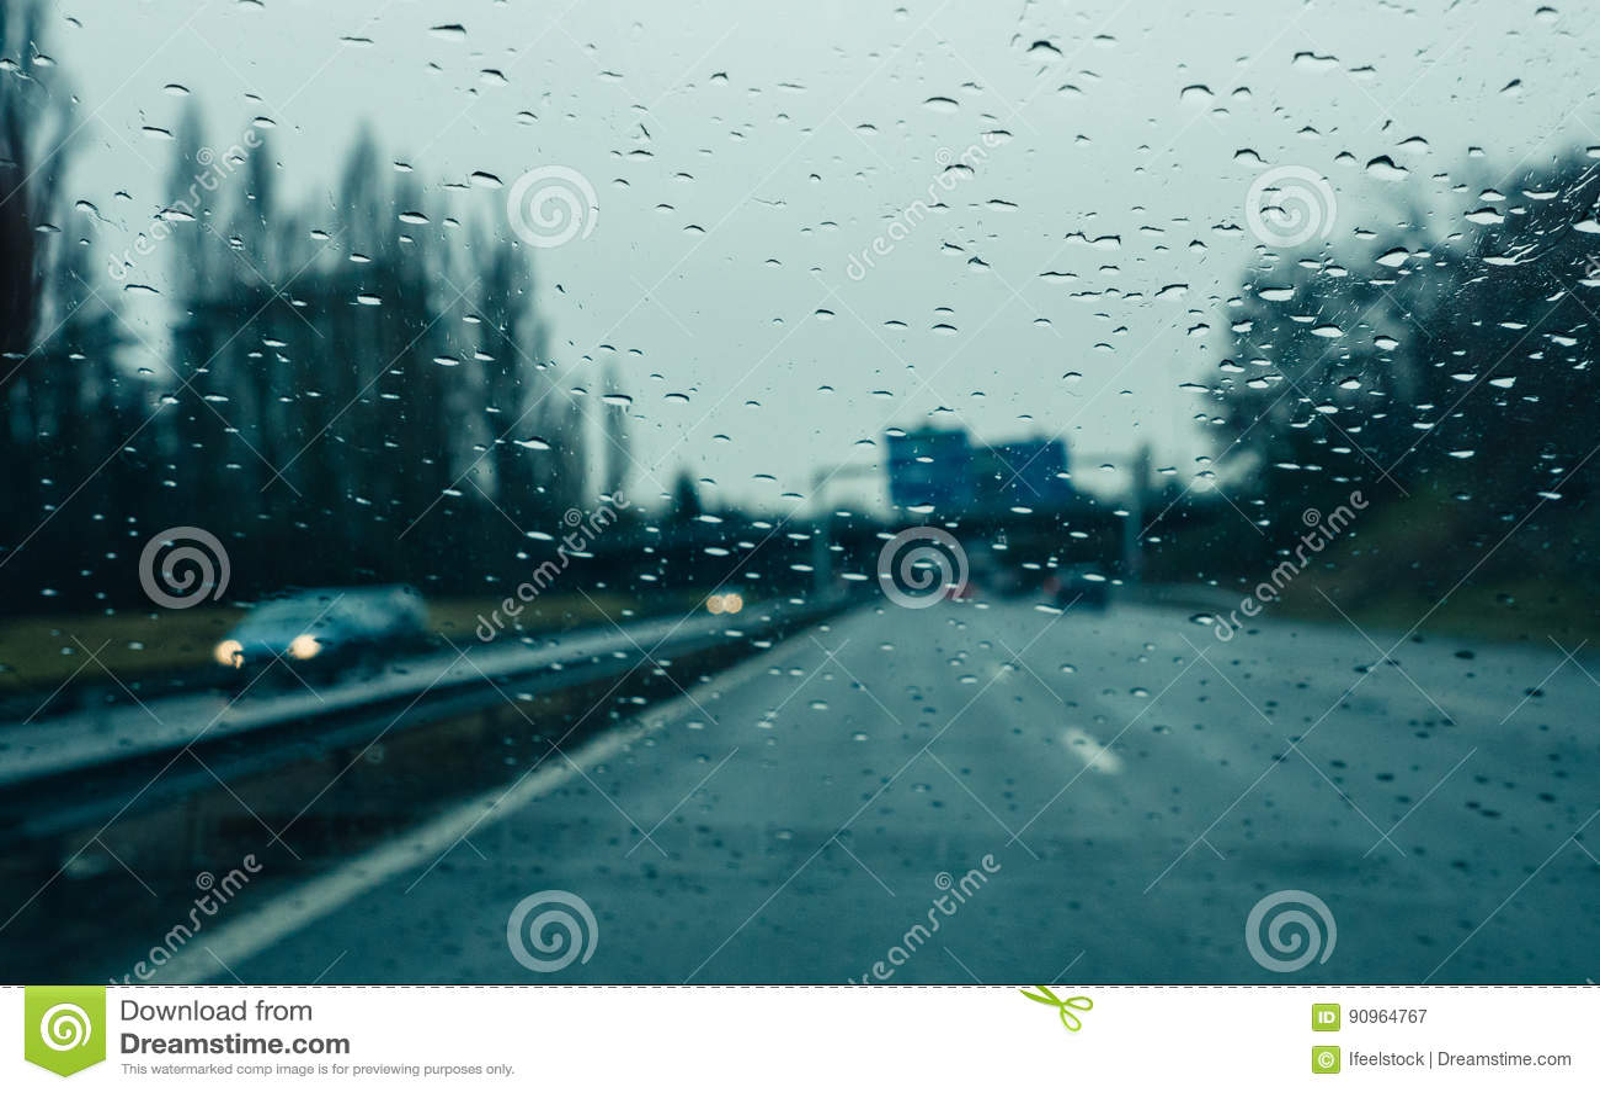 Windshield full with water drops on a heavy rain on highawy